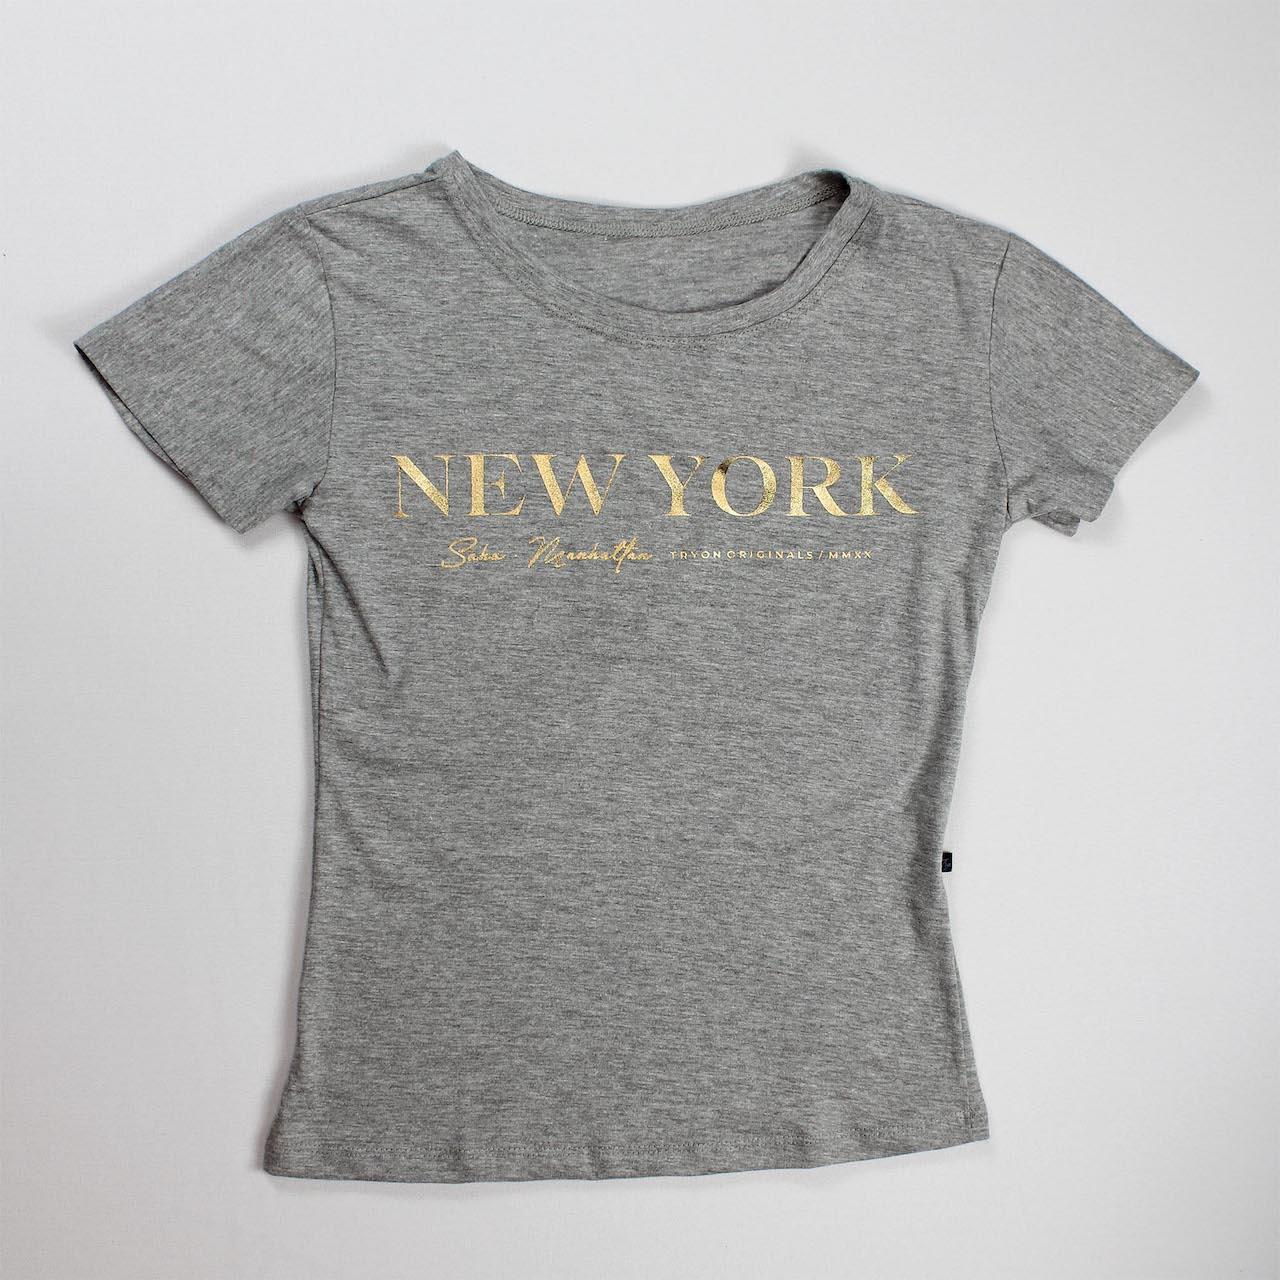 T-Shirt New York Feminina - Cinza e Dourada